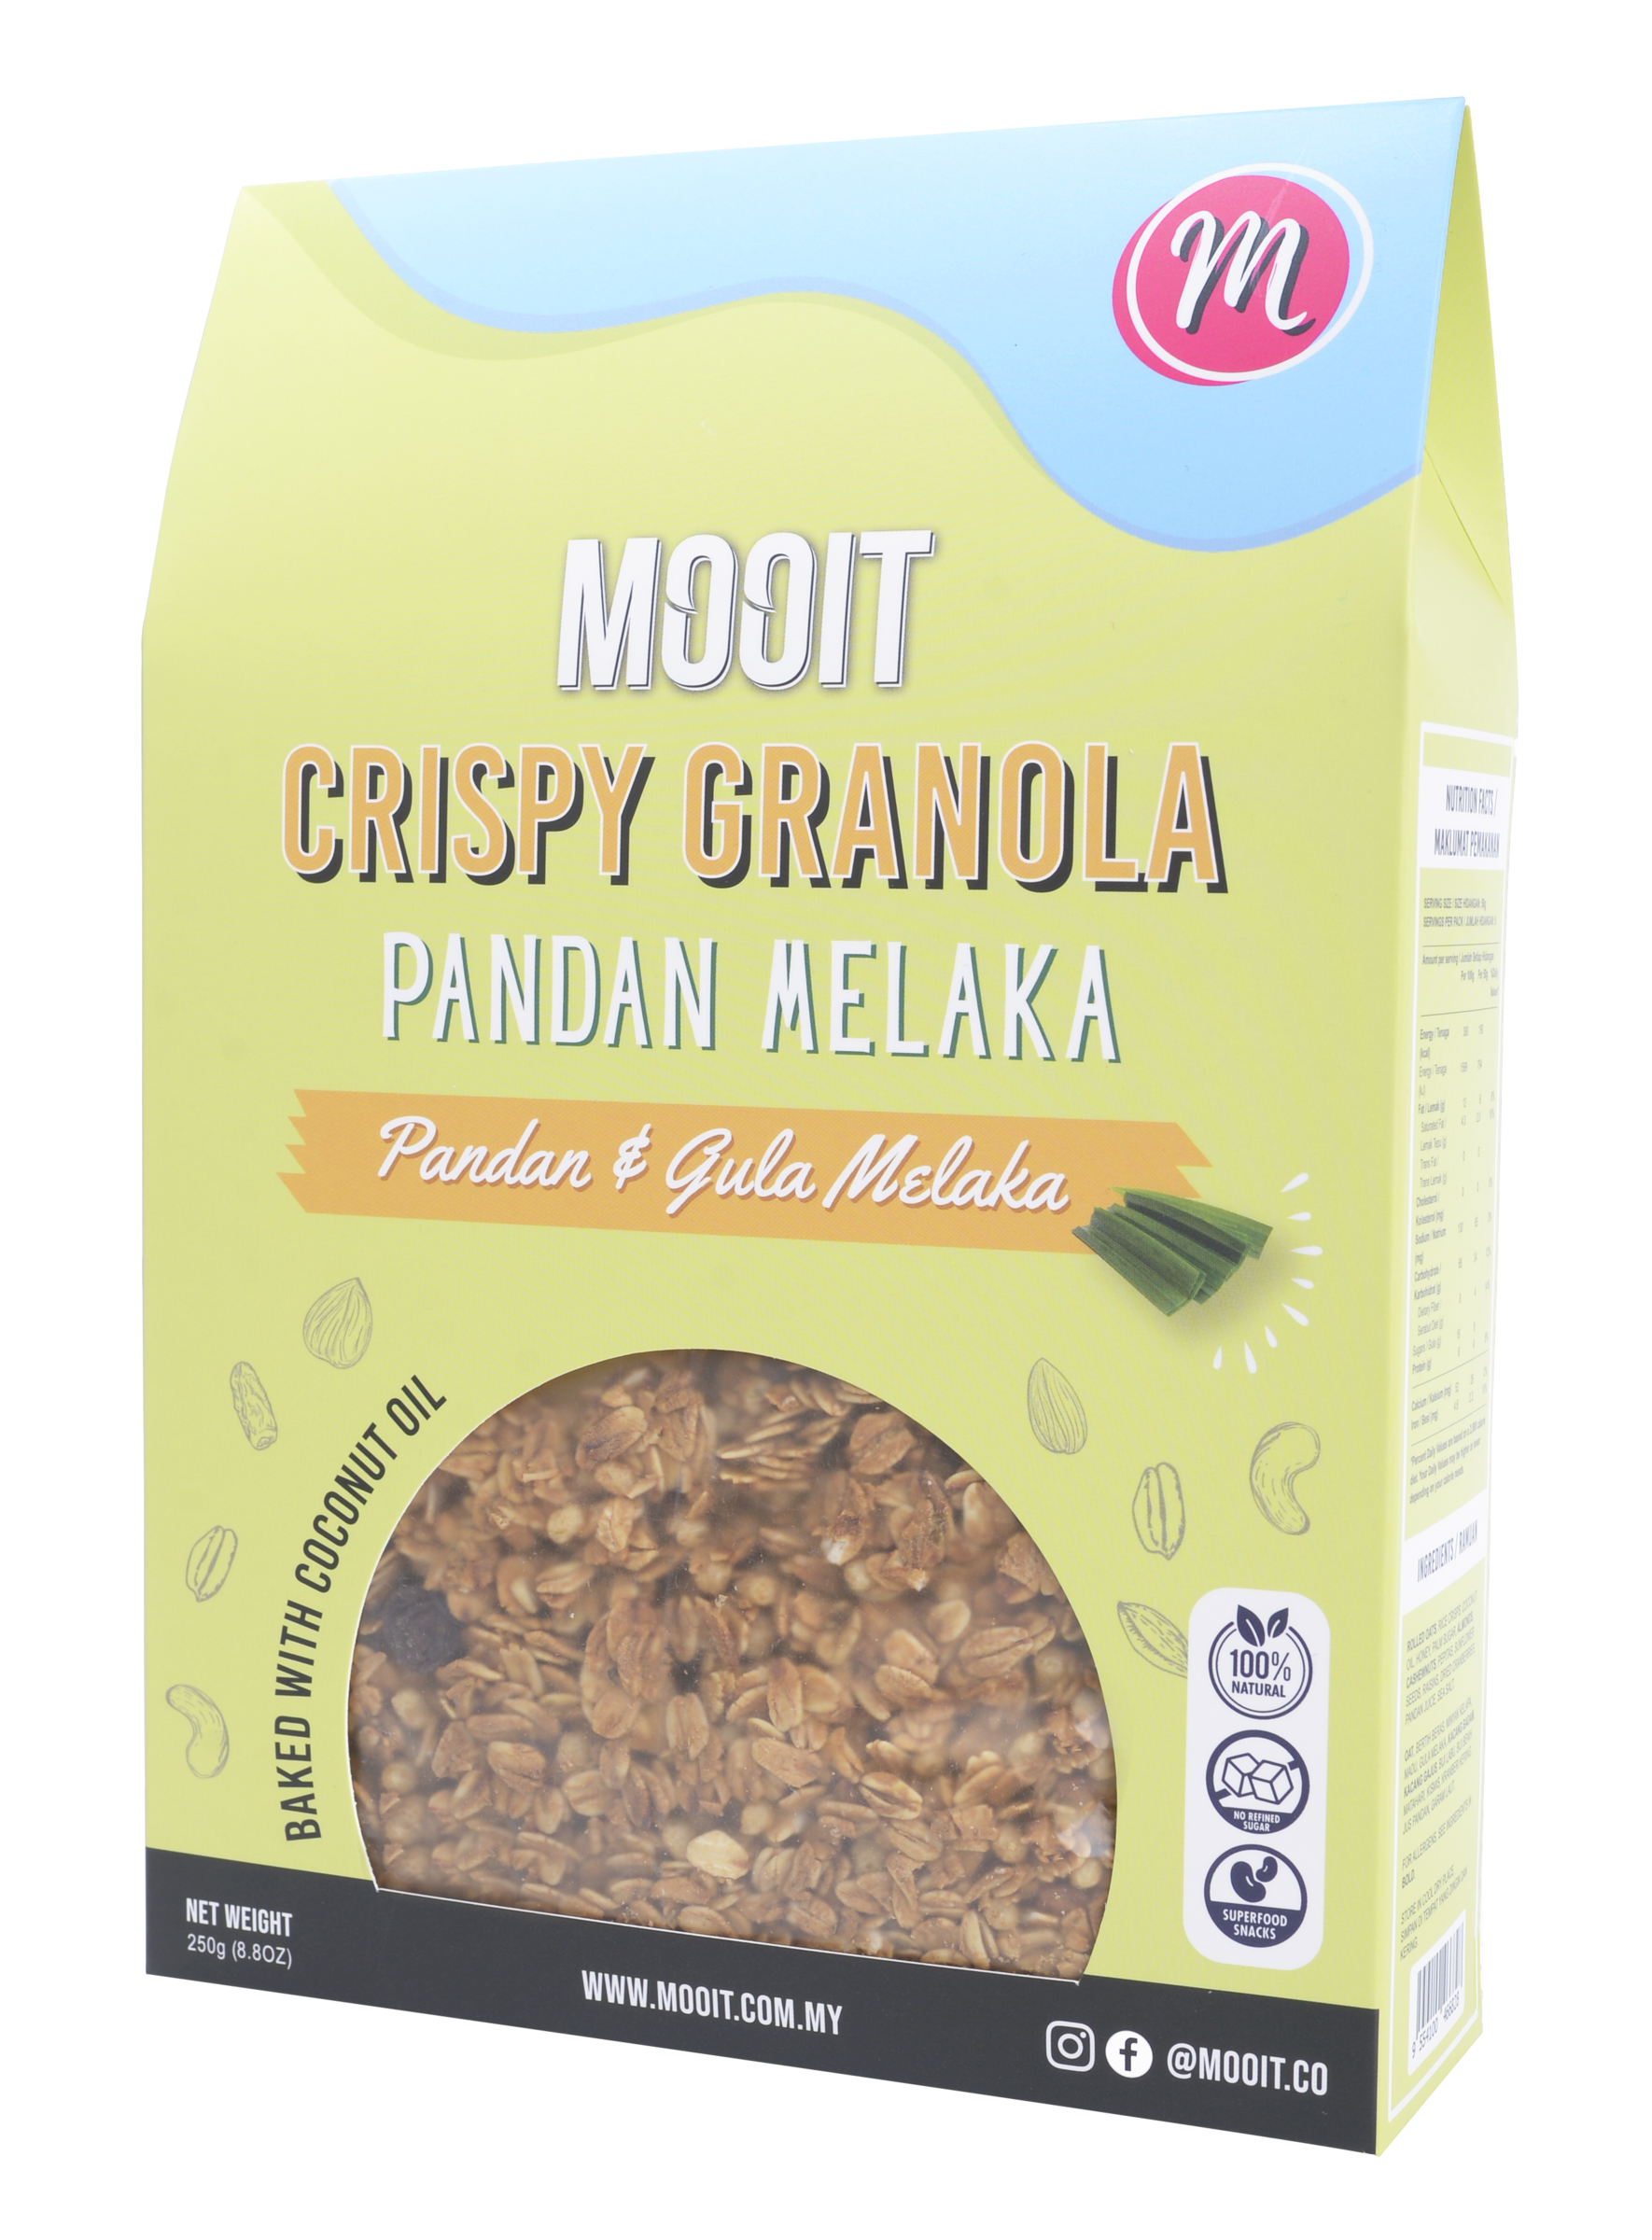 MOOIT-Pandan-Melaka-Granola-250g.png